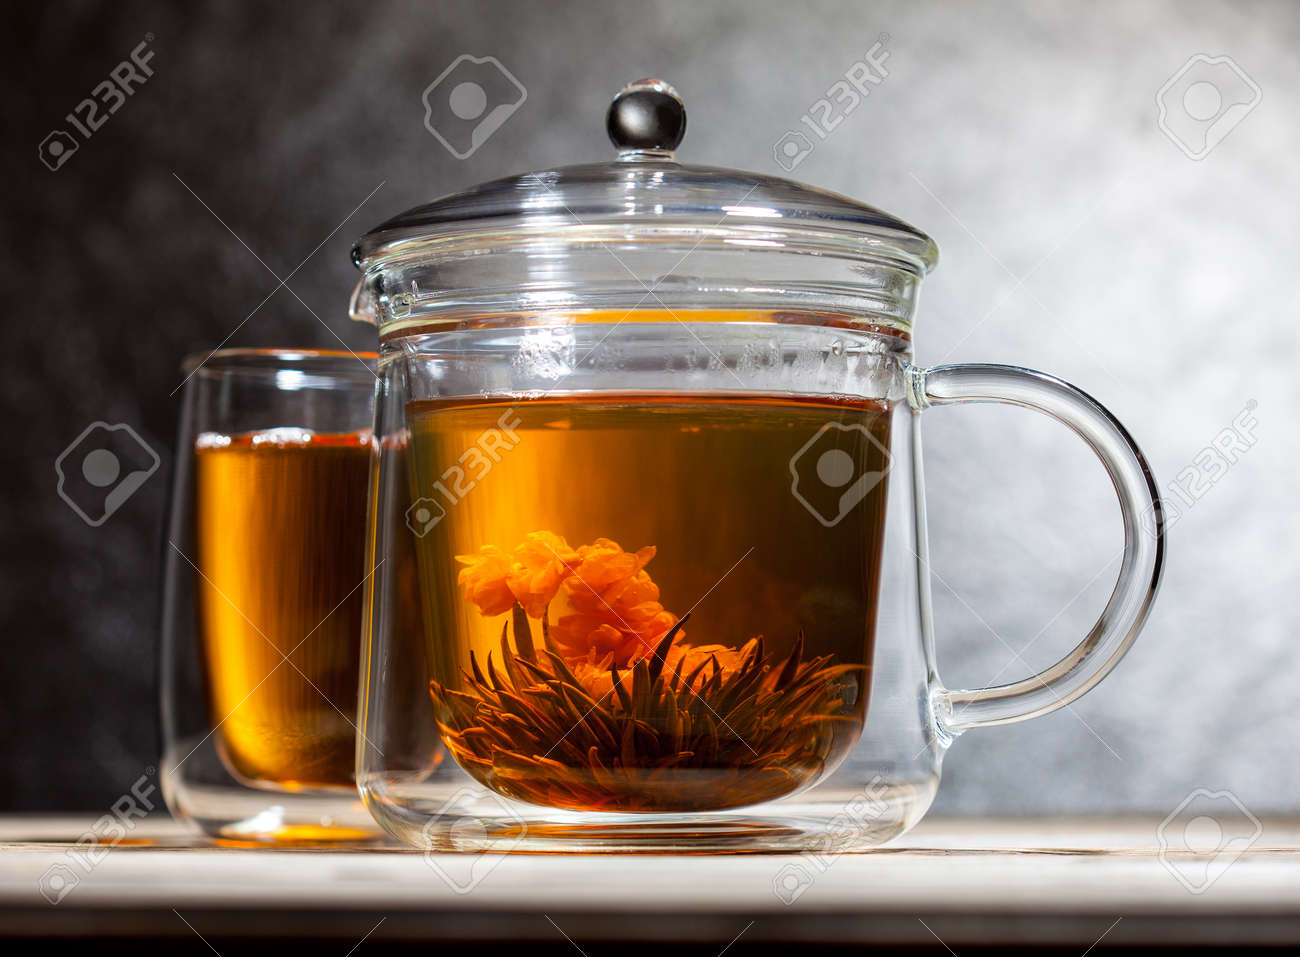 https fr 123rf com photo 48251646 le th c3 a9 vert chinois avec une fleur dans la th c3 a9i c3 a8re en verre transparent html